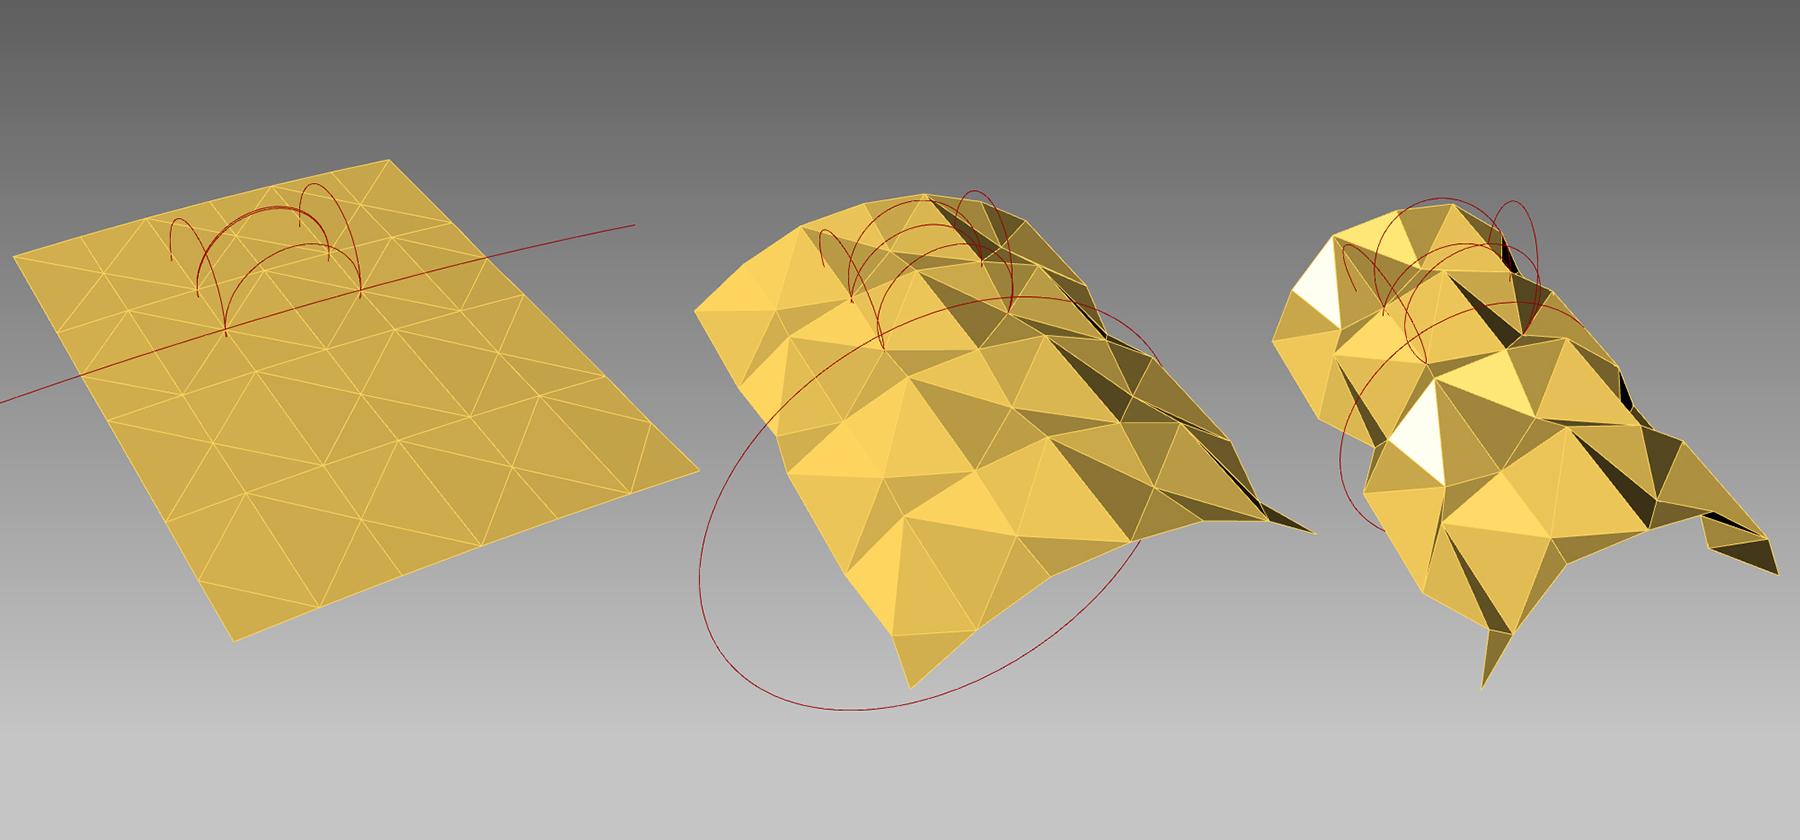 Largest Origami magic ball challenge | 840x1800